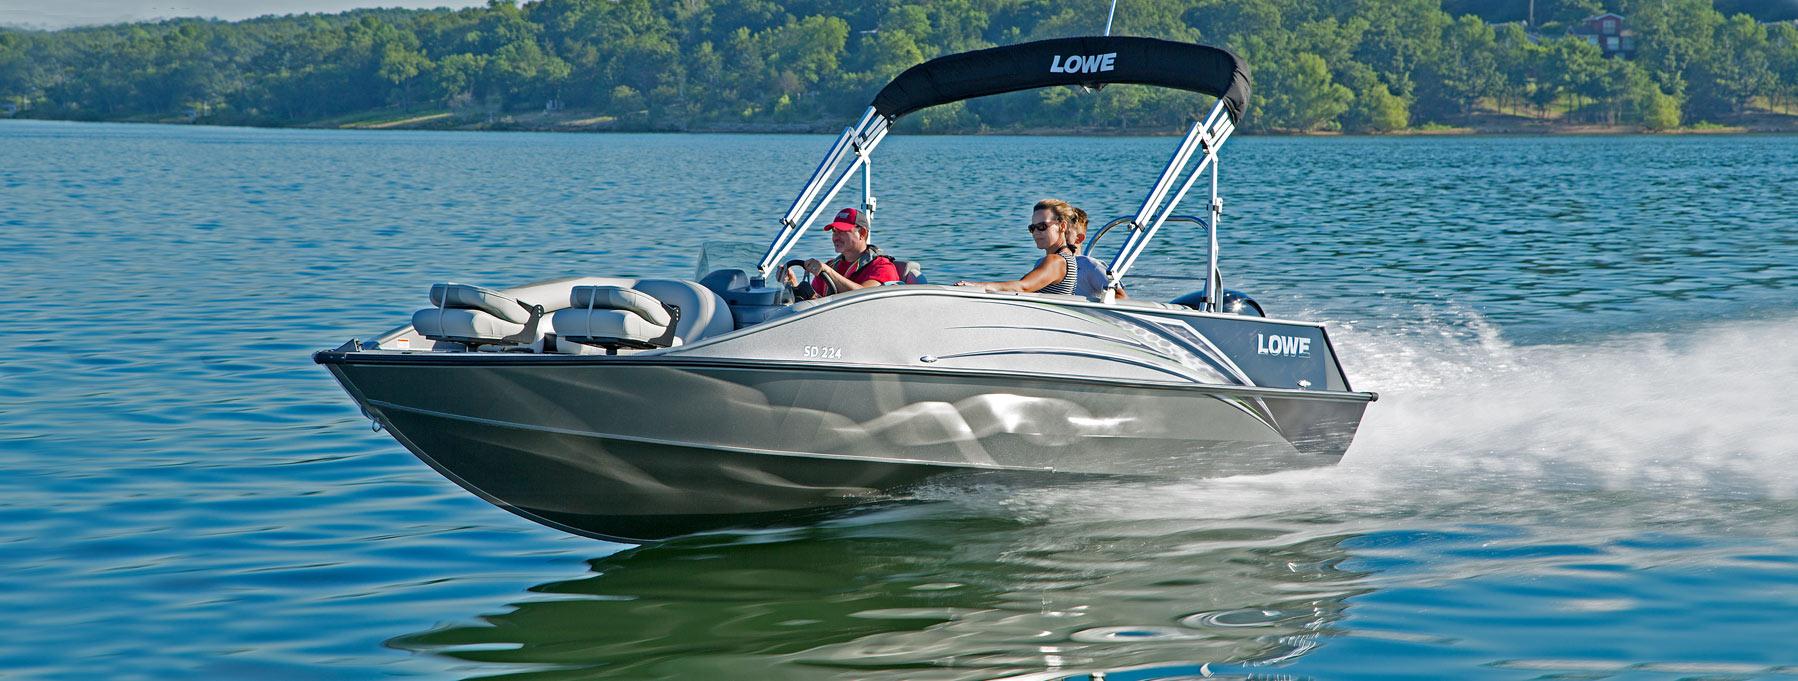 2019 SD224 Fishing Ski Aluminum Deck Boat   Lowe Boats